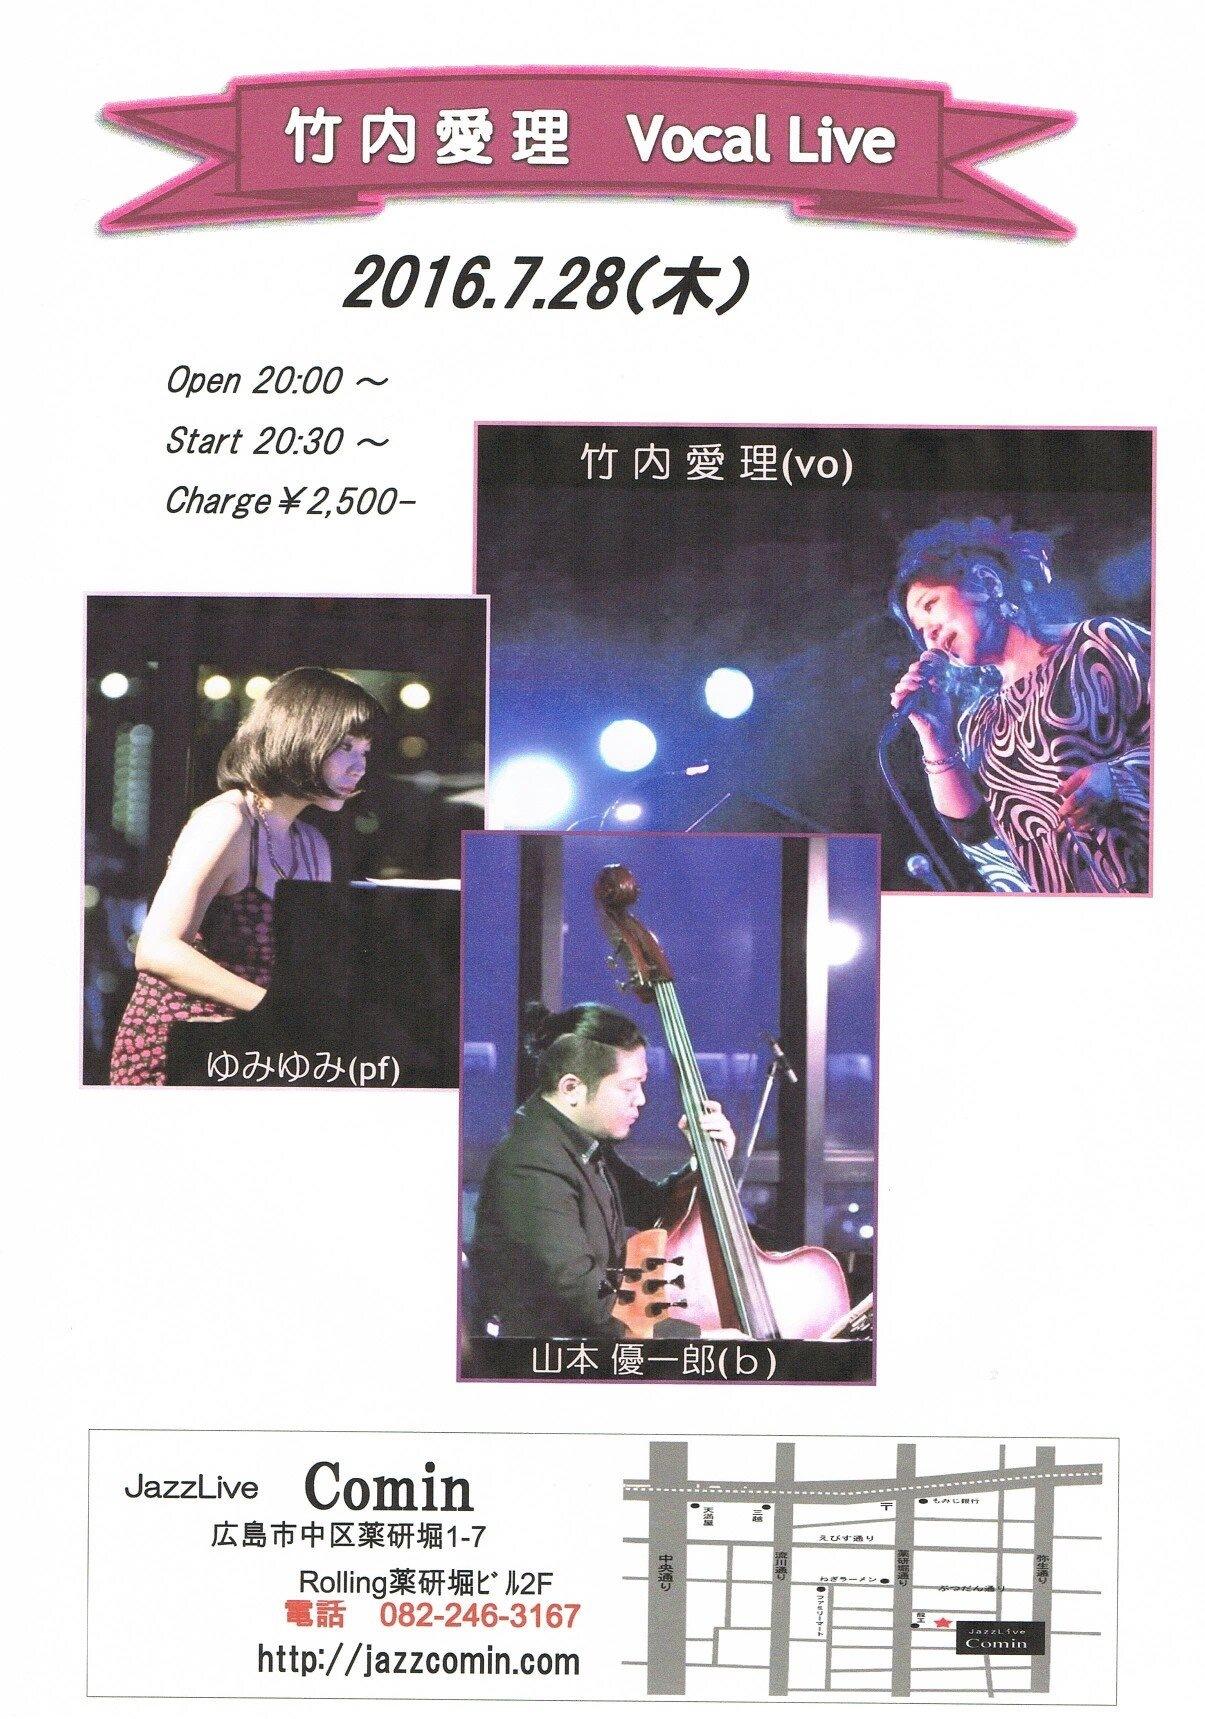 Jazzlive comin 本日木曜日は ジャズボーカルです。_b0115606_13430477.jpeg